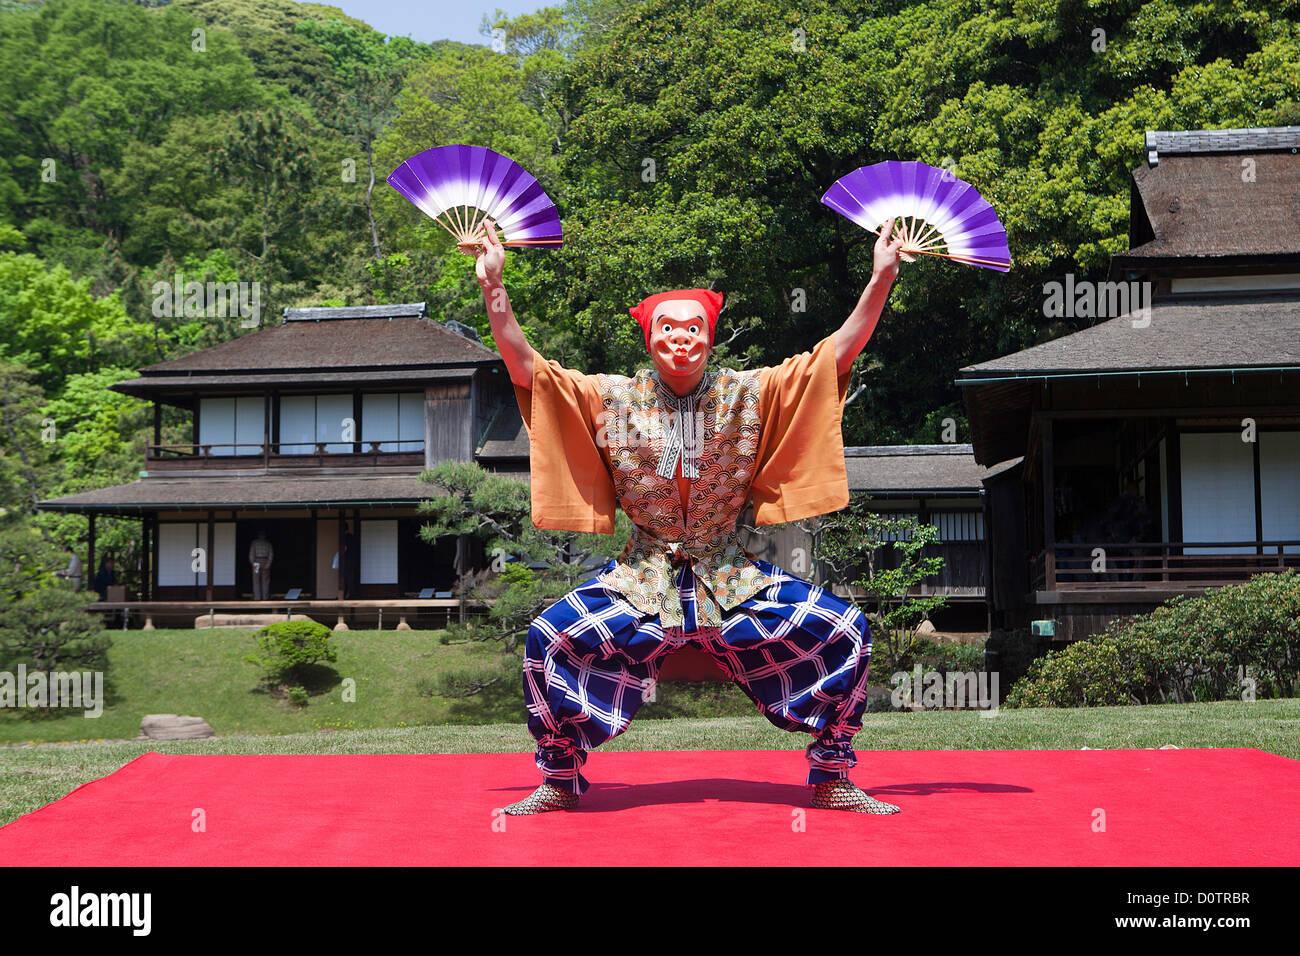 Giappone, Asia, vacanze, viaggi, Yokohama, Sankei-en, giardino, tradizionale, costume, danza, performer Immagini Stock